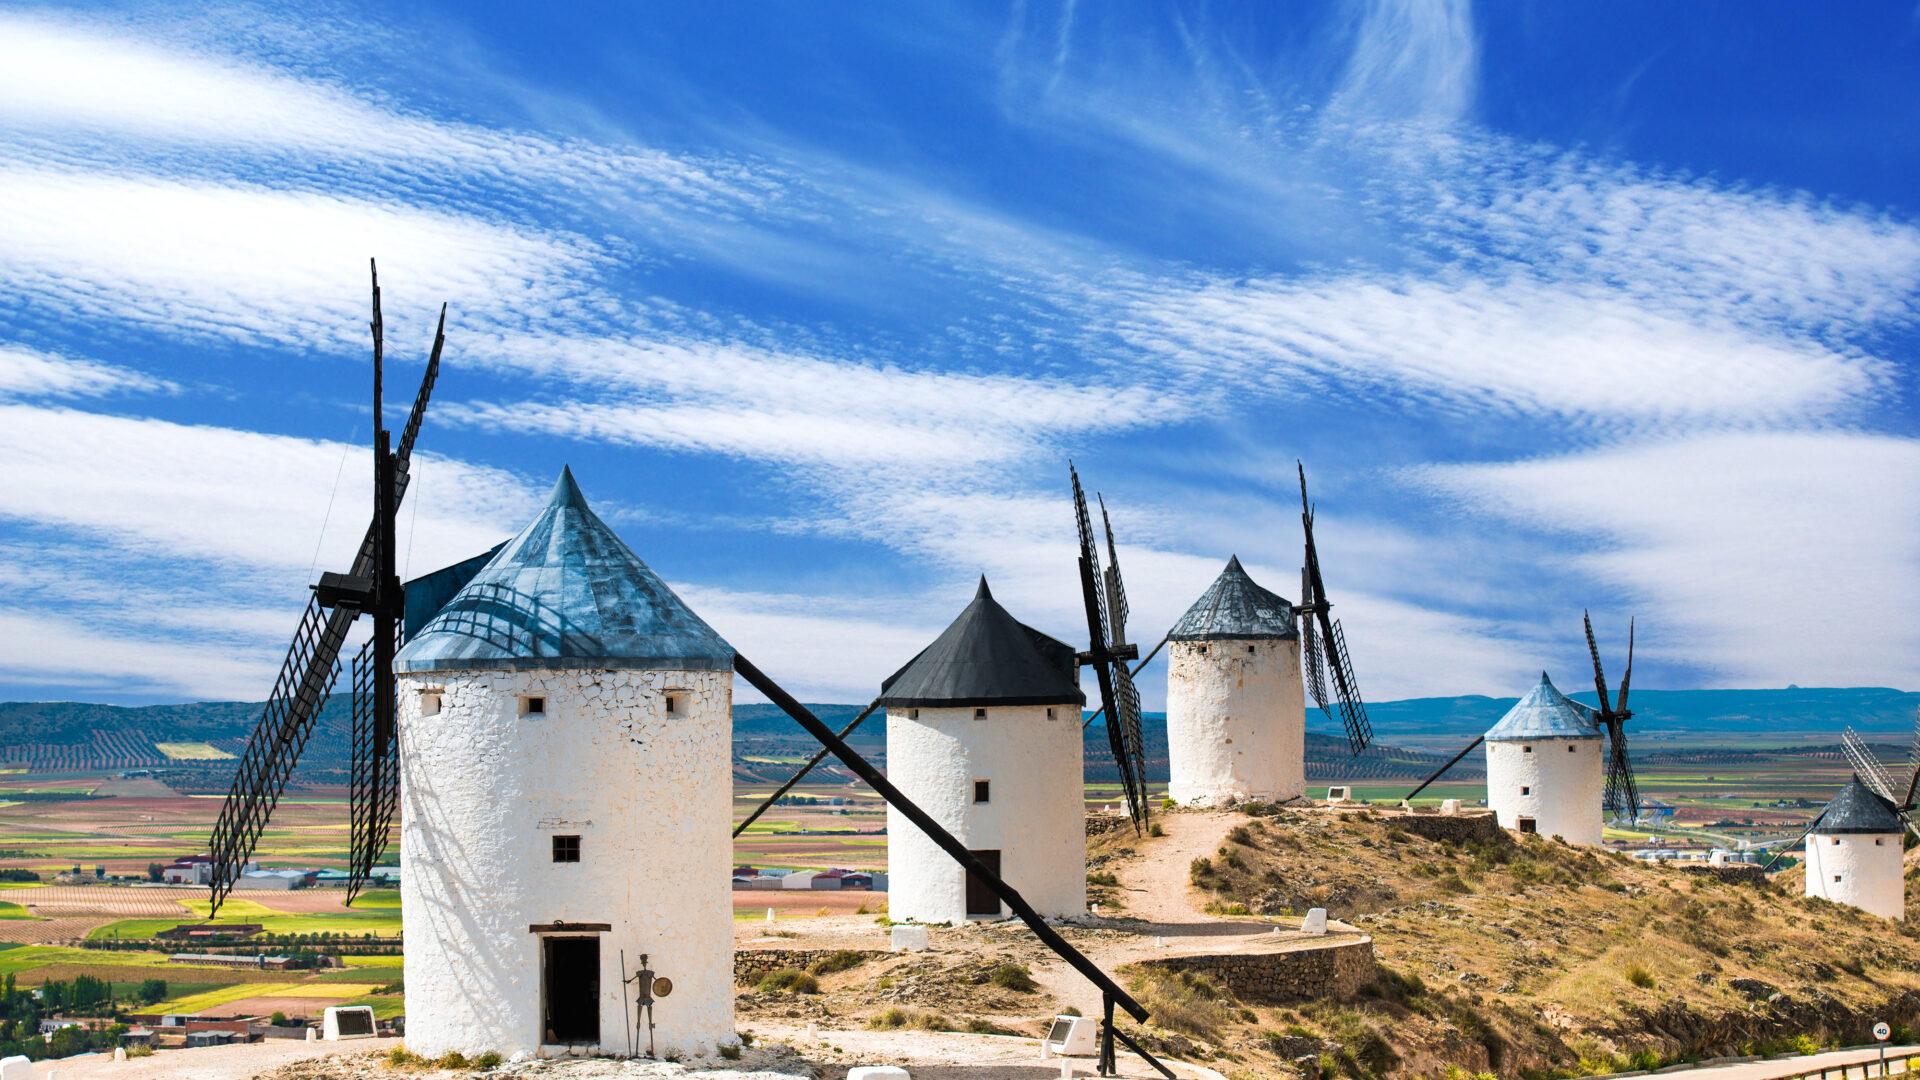 White wind mills in Spain